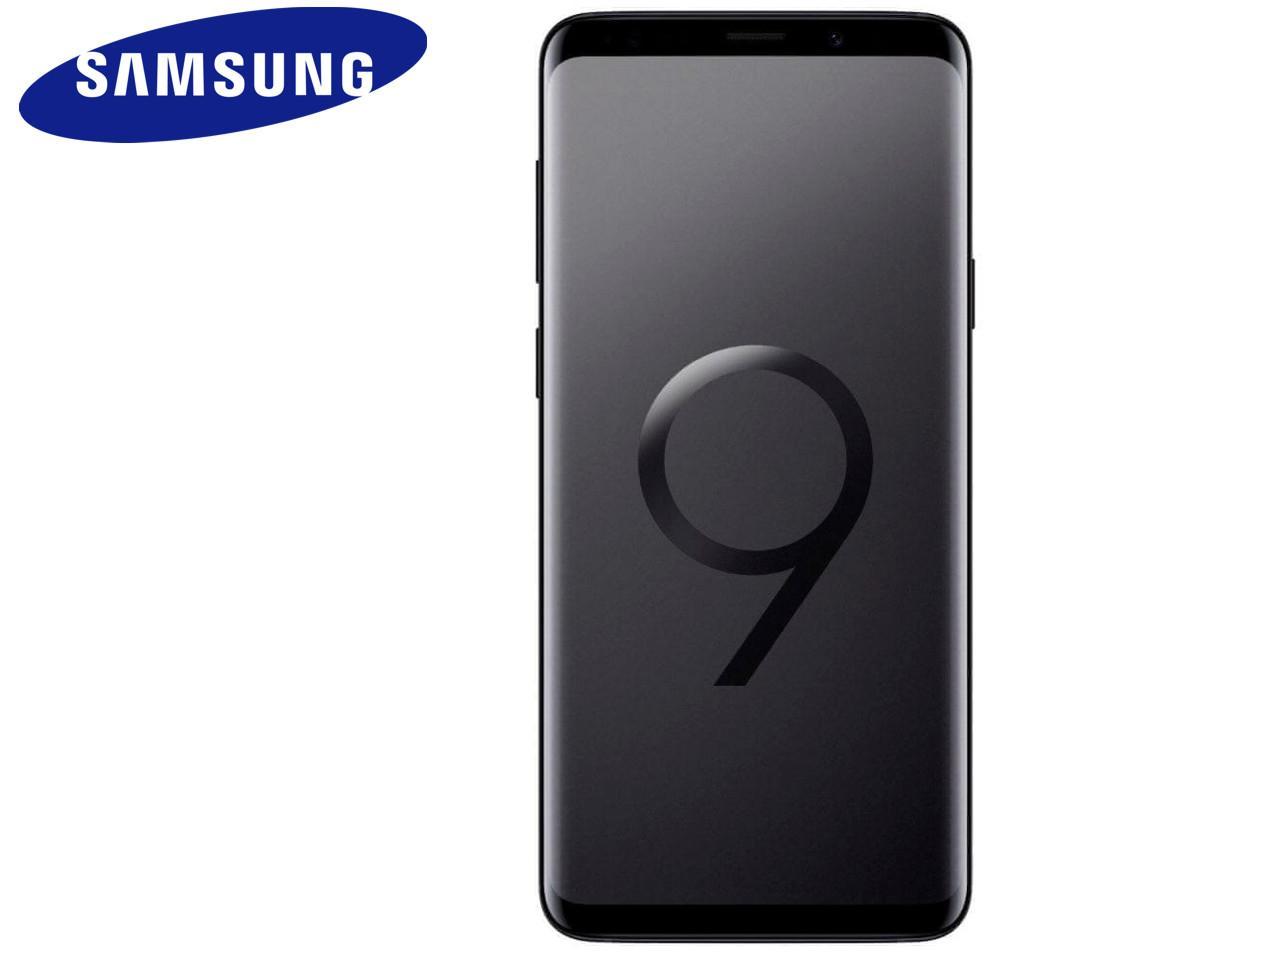 SAMSUNG Galaxy S9 Plus (SM-G965F), 64 GB, Dual SIM, černý, CZ distribuce